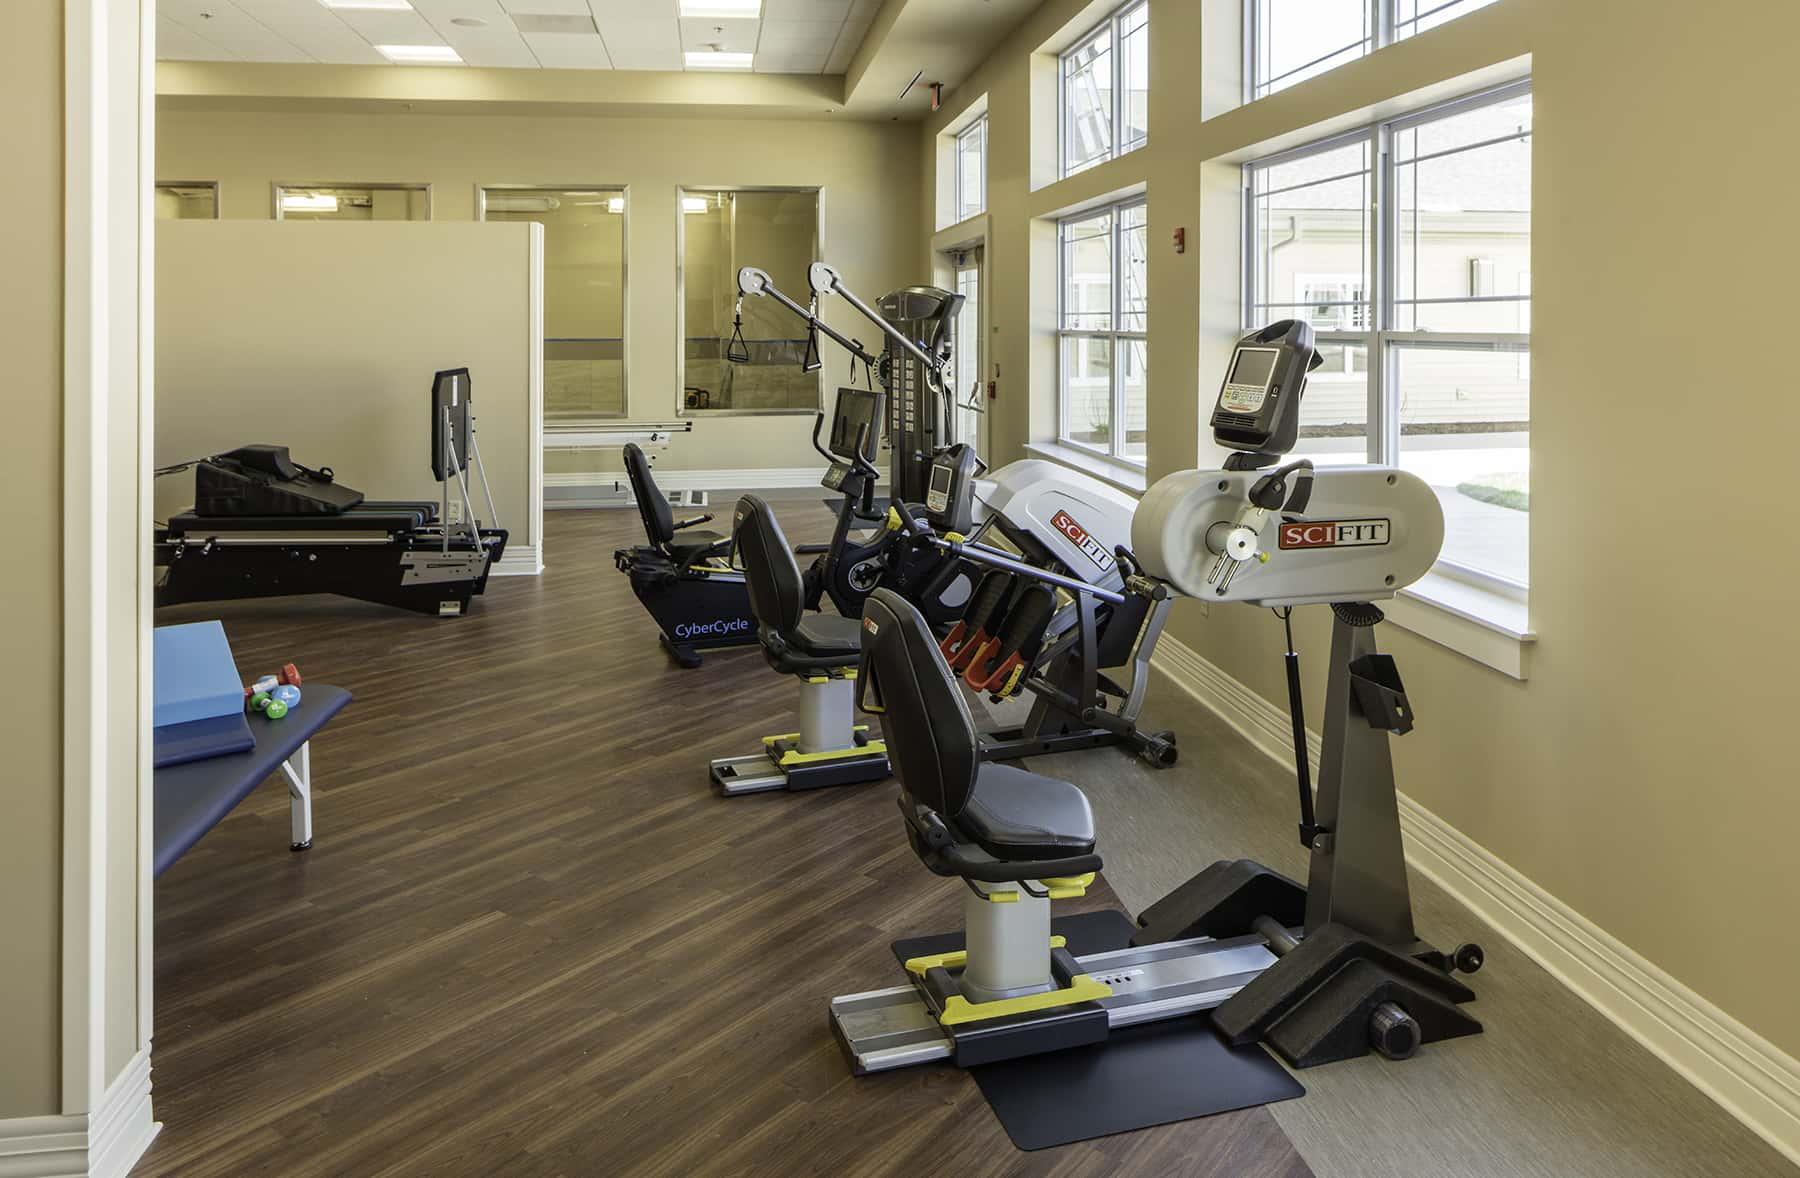 Exercise room machines